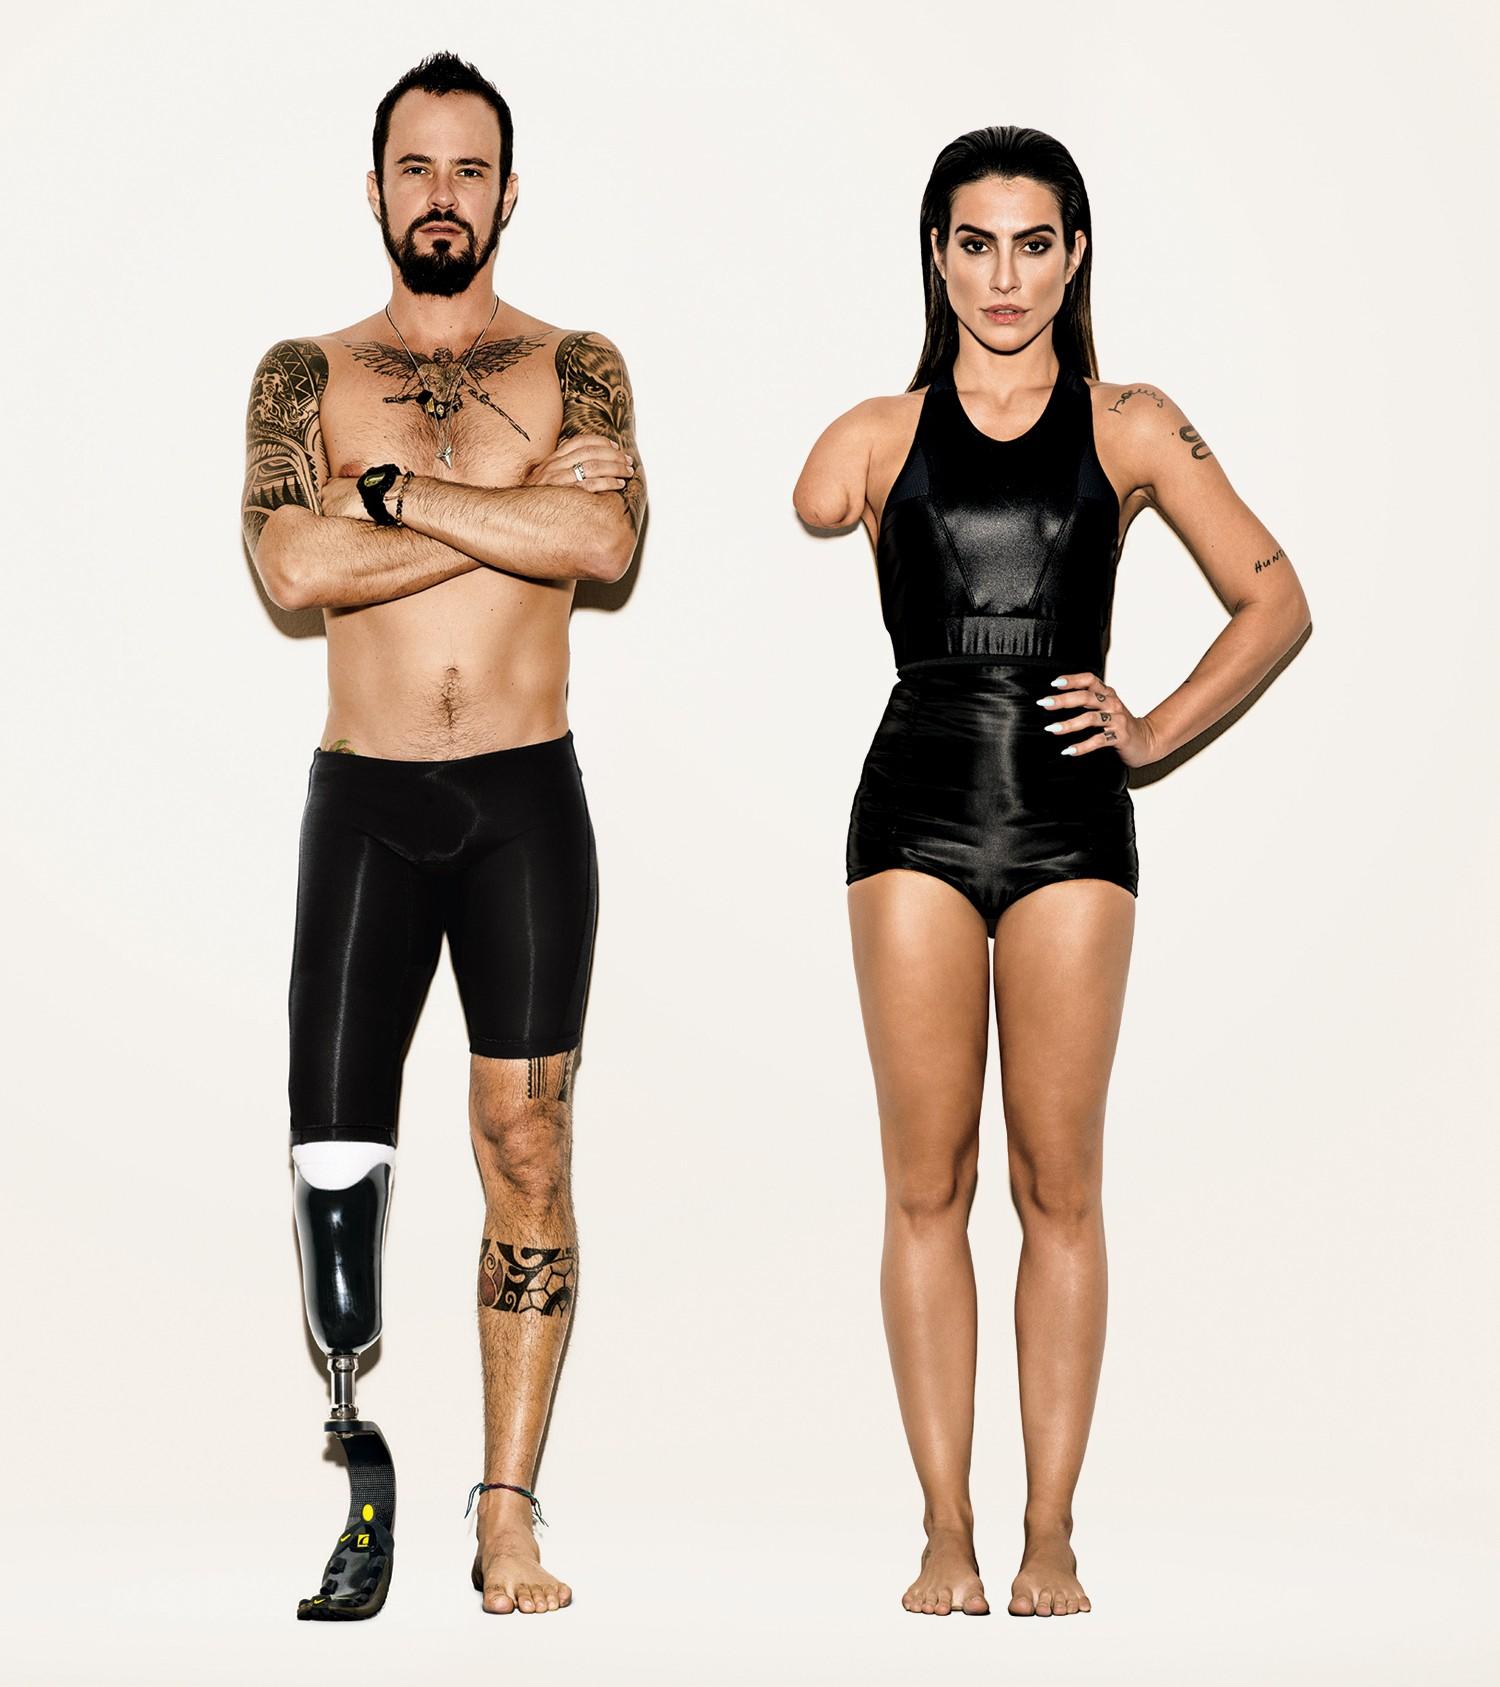 Cleo Pires e Paulo Vilhena - Paralimpíada (Foto: Reprodução)